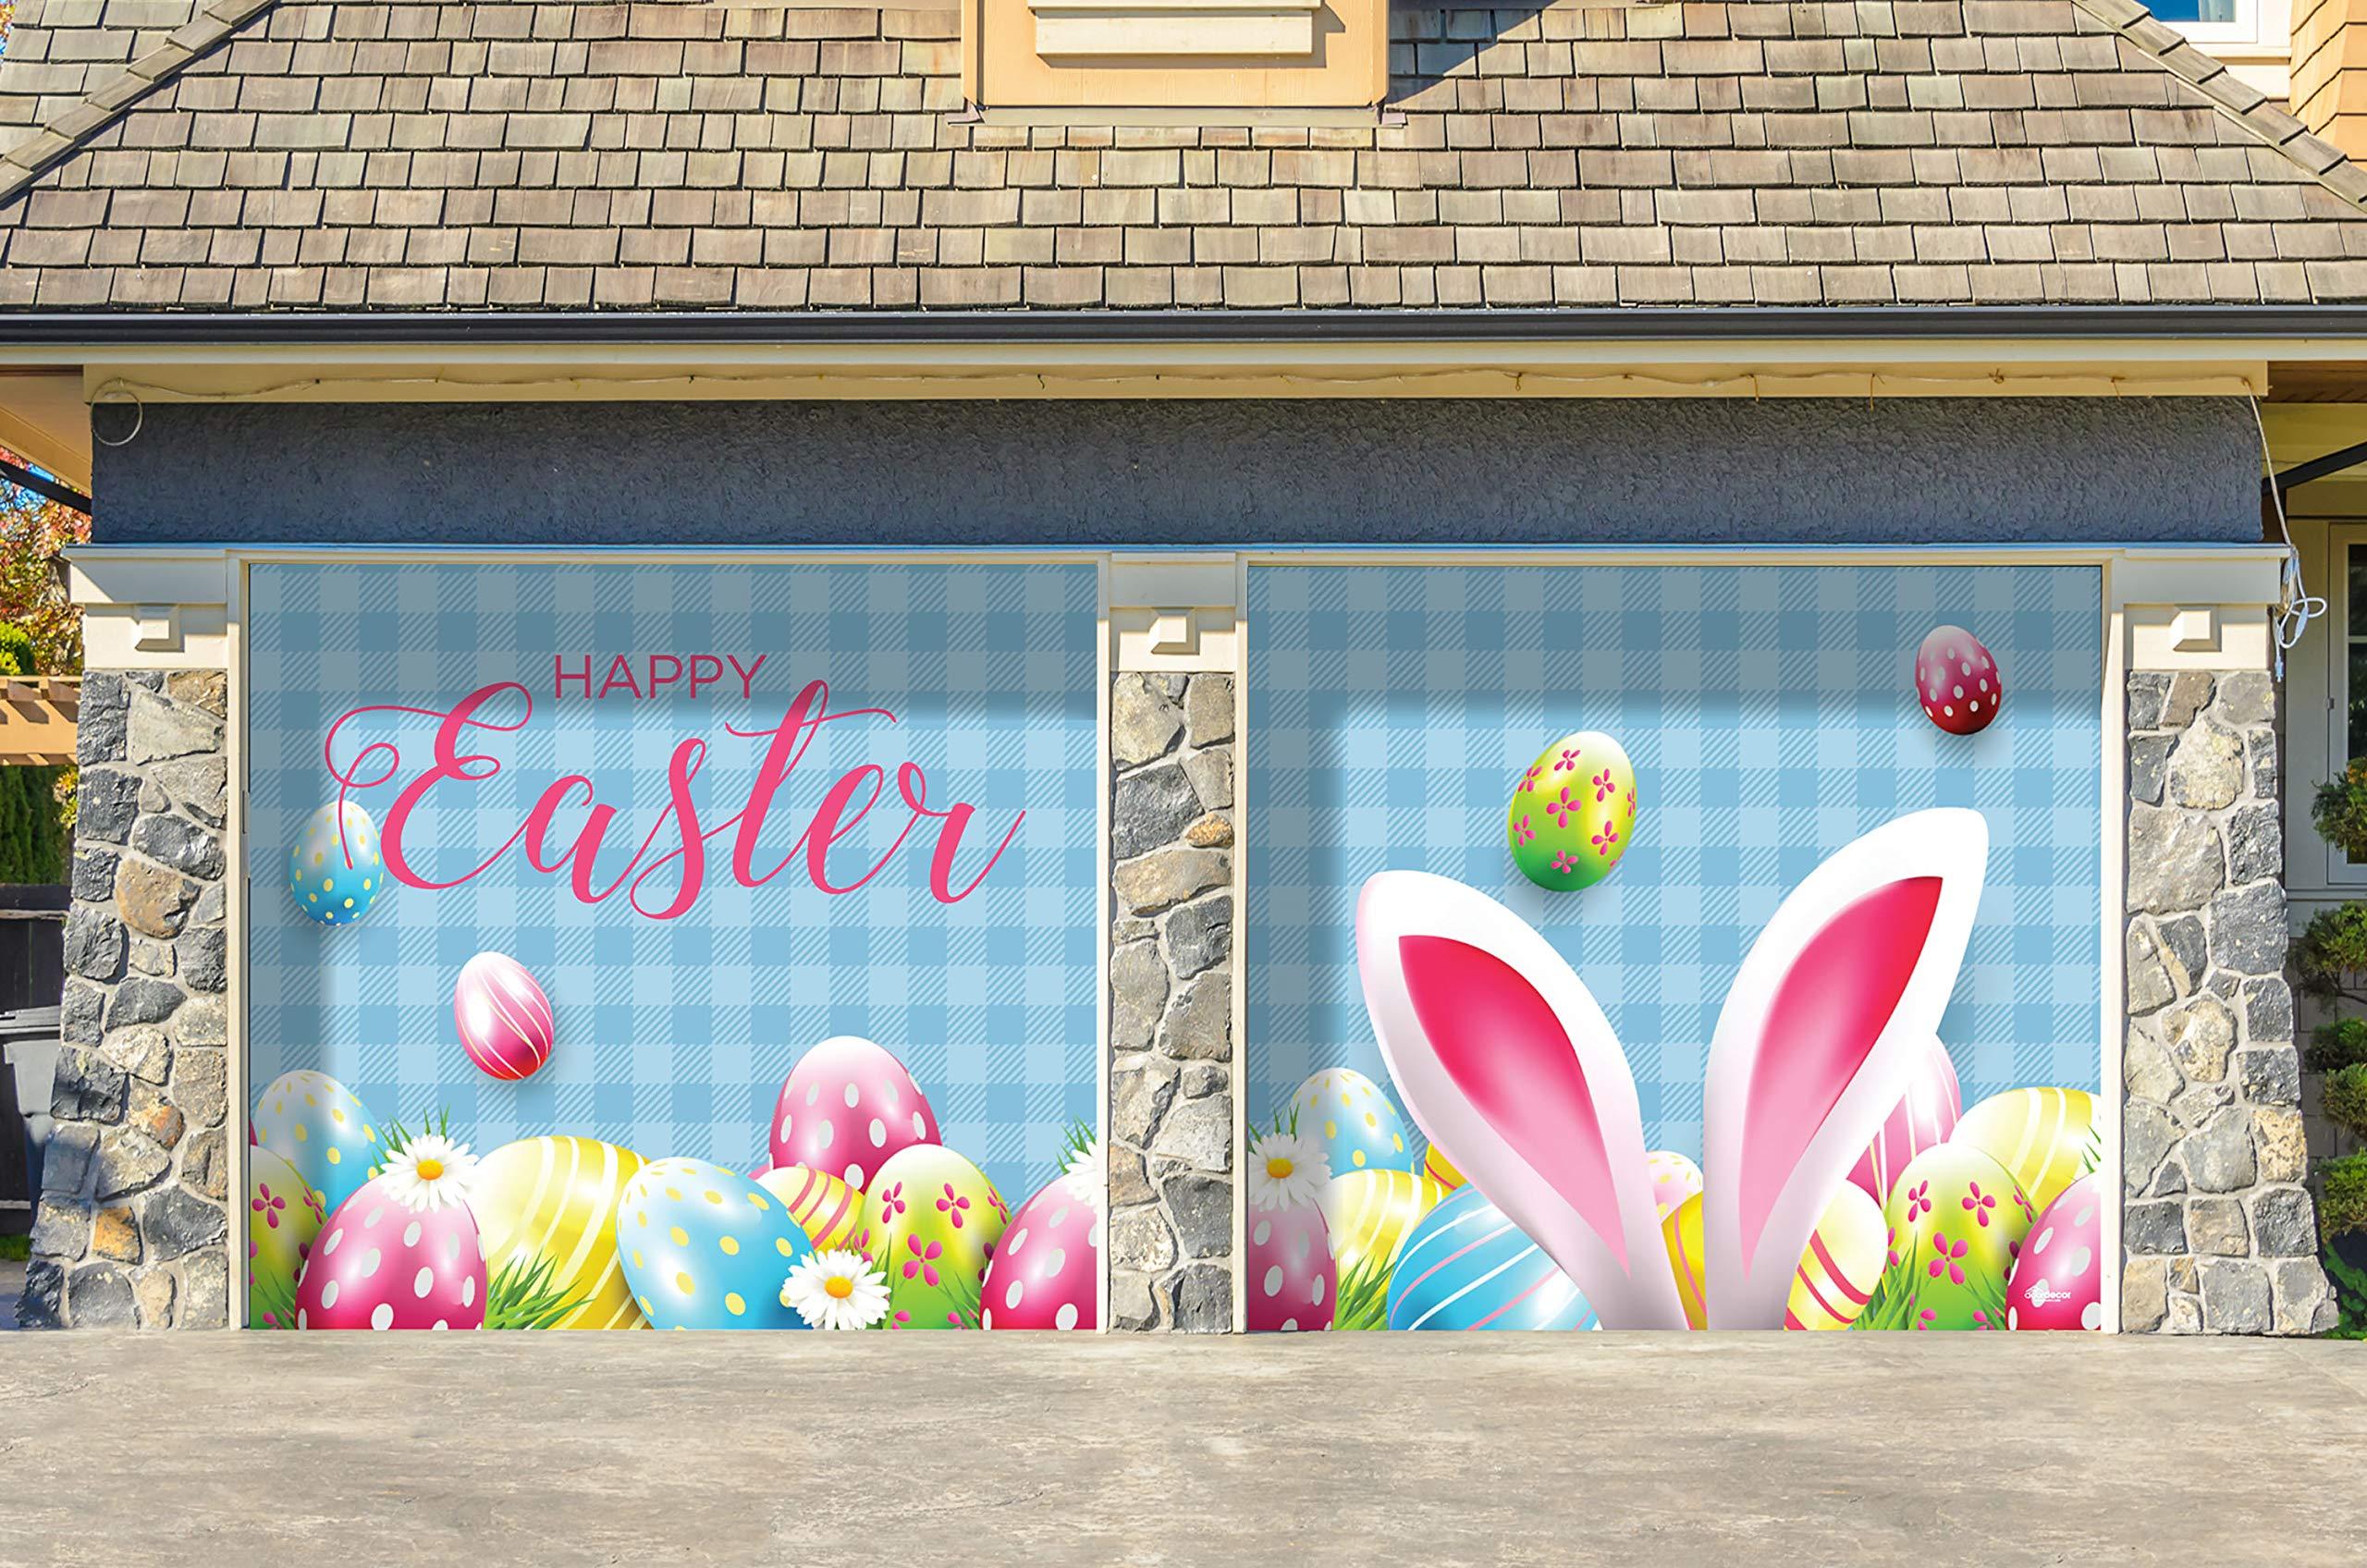 Victory Corps Happy Easter Bunny Ears - Holiday Garage Door Banner Mural Sign Décor 7'x 8' Split Car Garage - The Original Holiday Garage Door Banner Decor